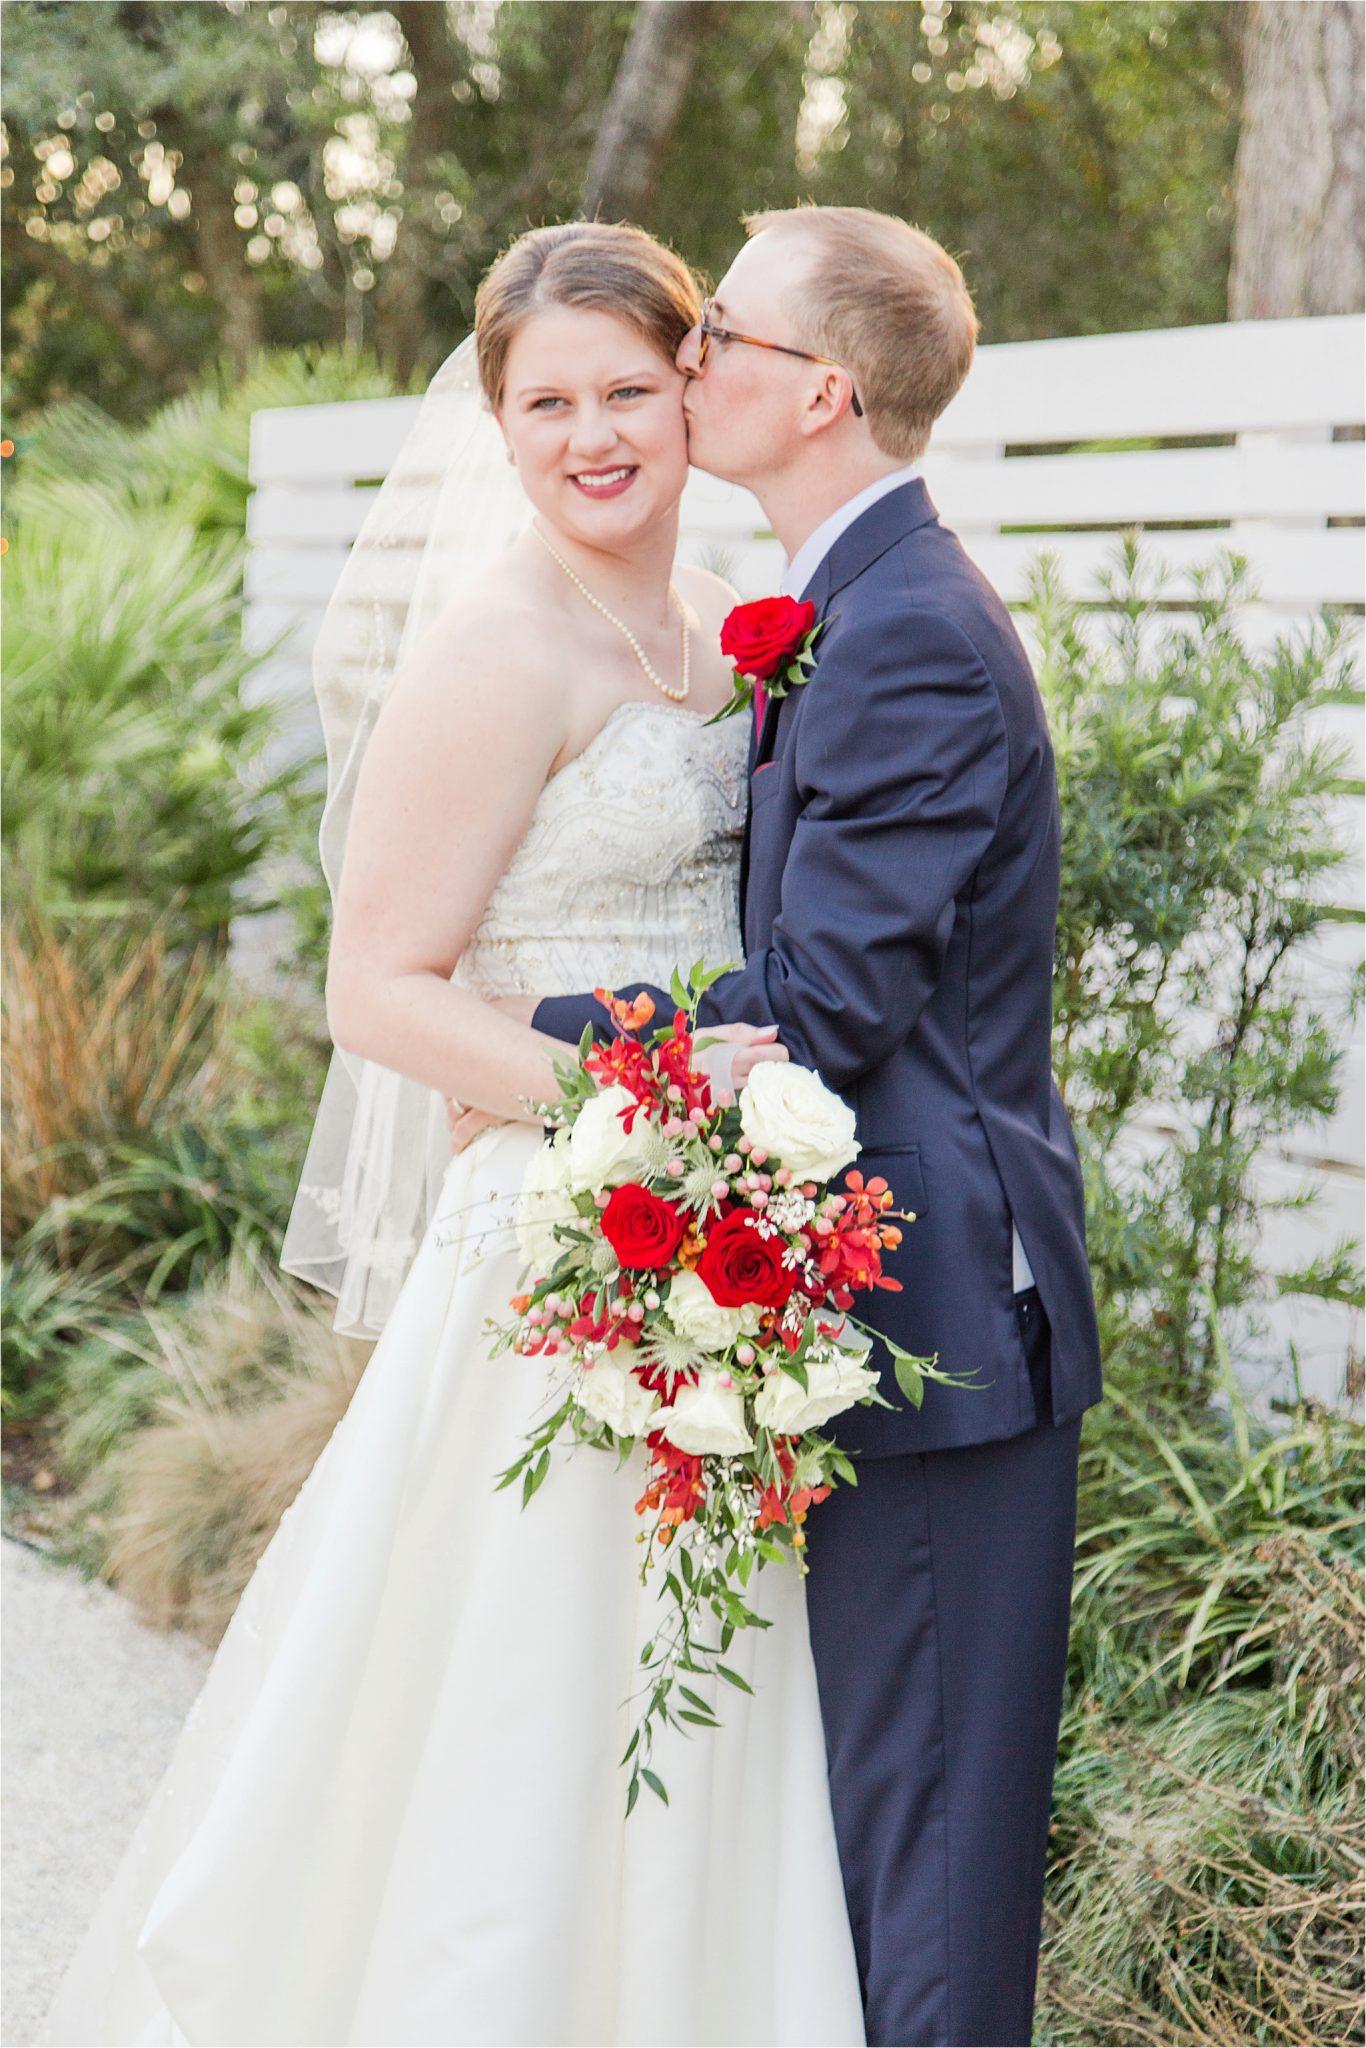 Alabama Wedding Photographer-Little Point Clear Winter Wedding-Meri Beth + Andrew-Bride and Groom-Wedding florals-Wedding bouquet